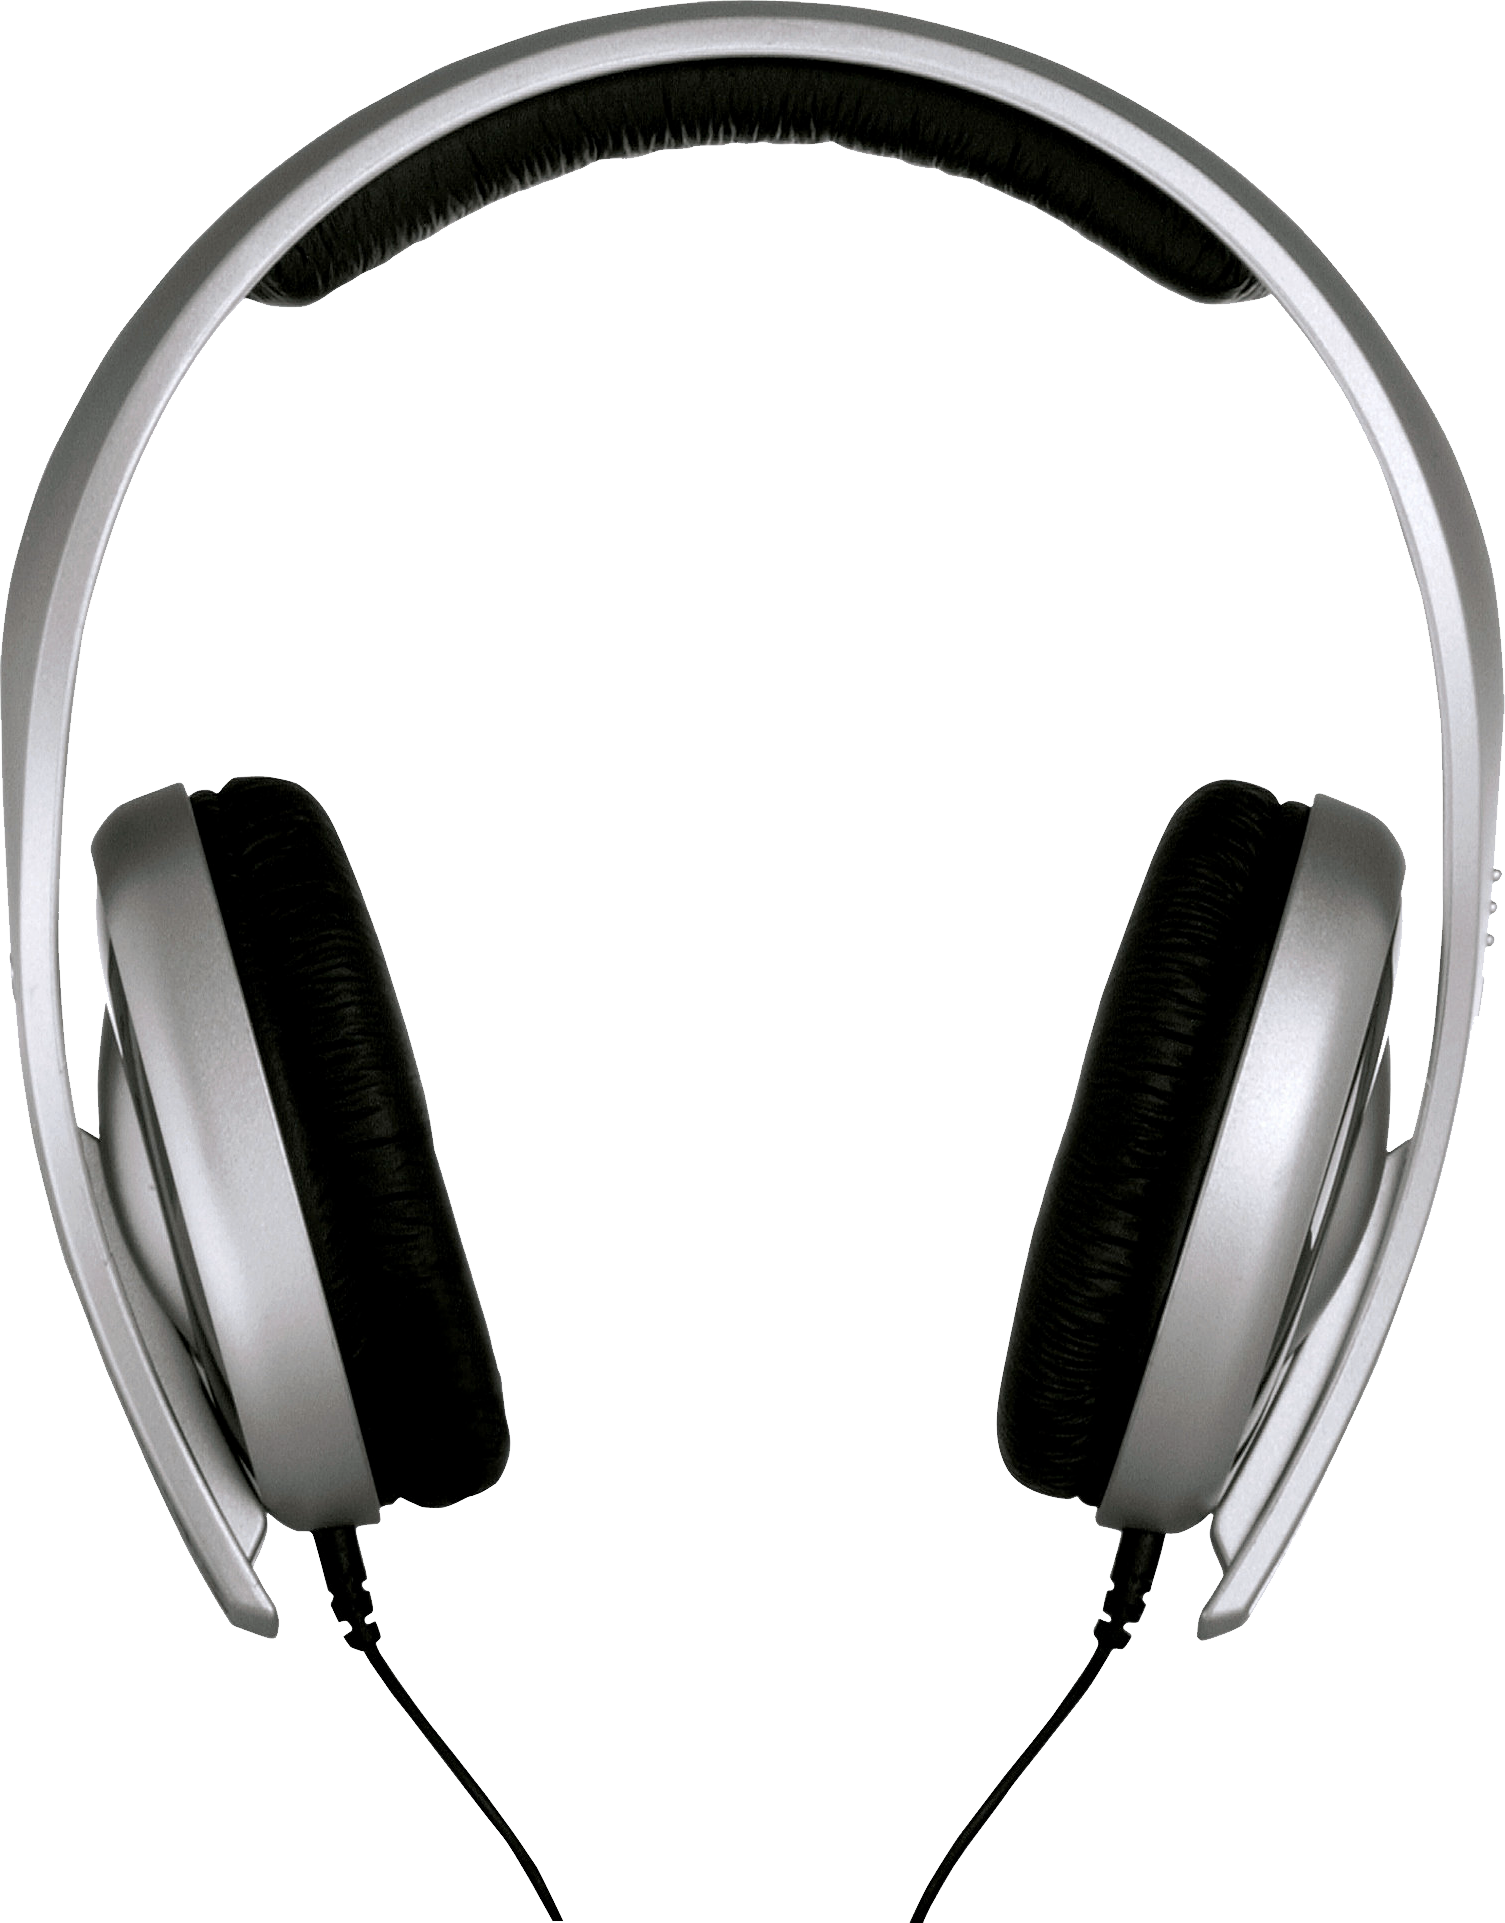 Music Headphone Image Pure Free Transparent Cc0 Library